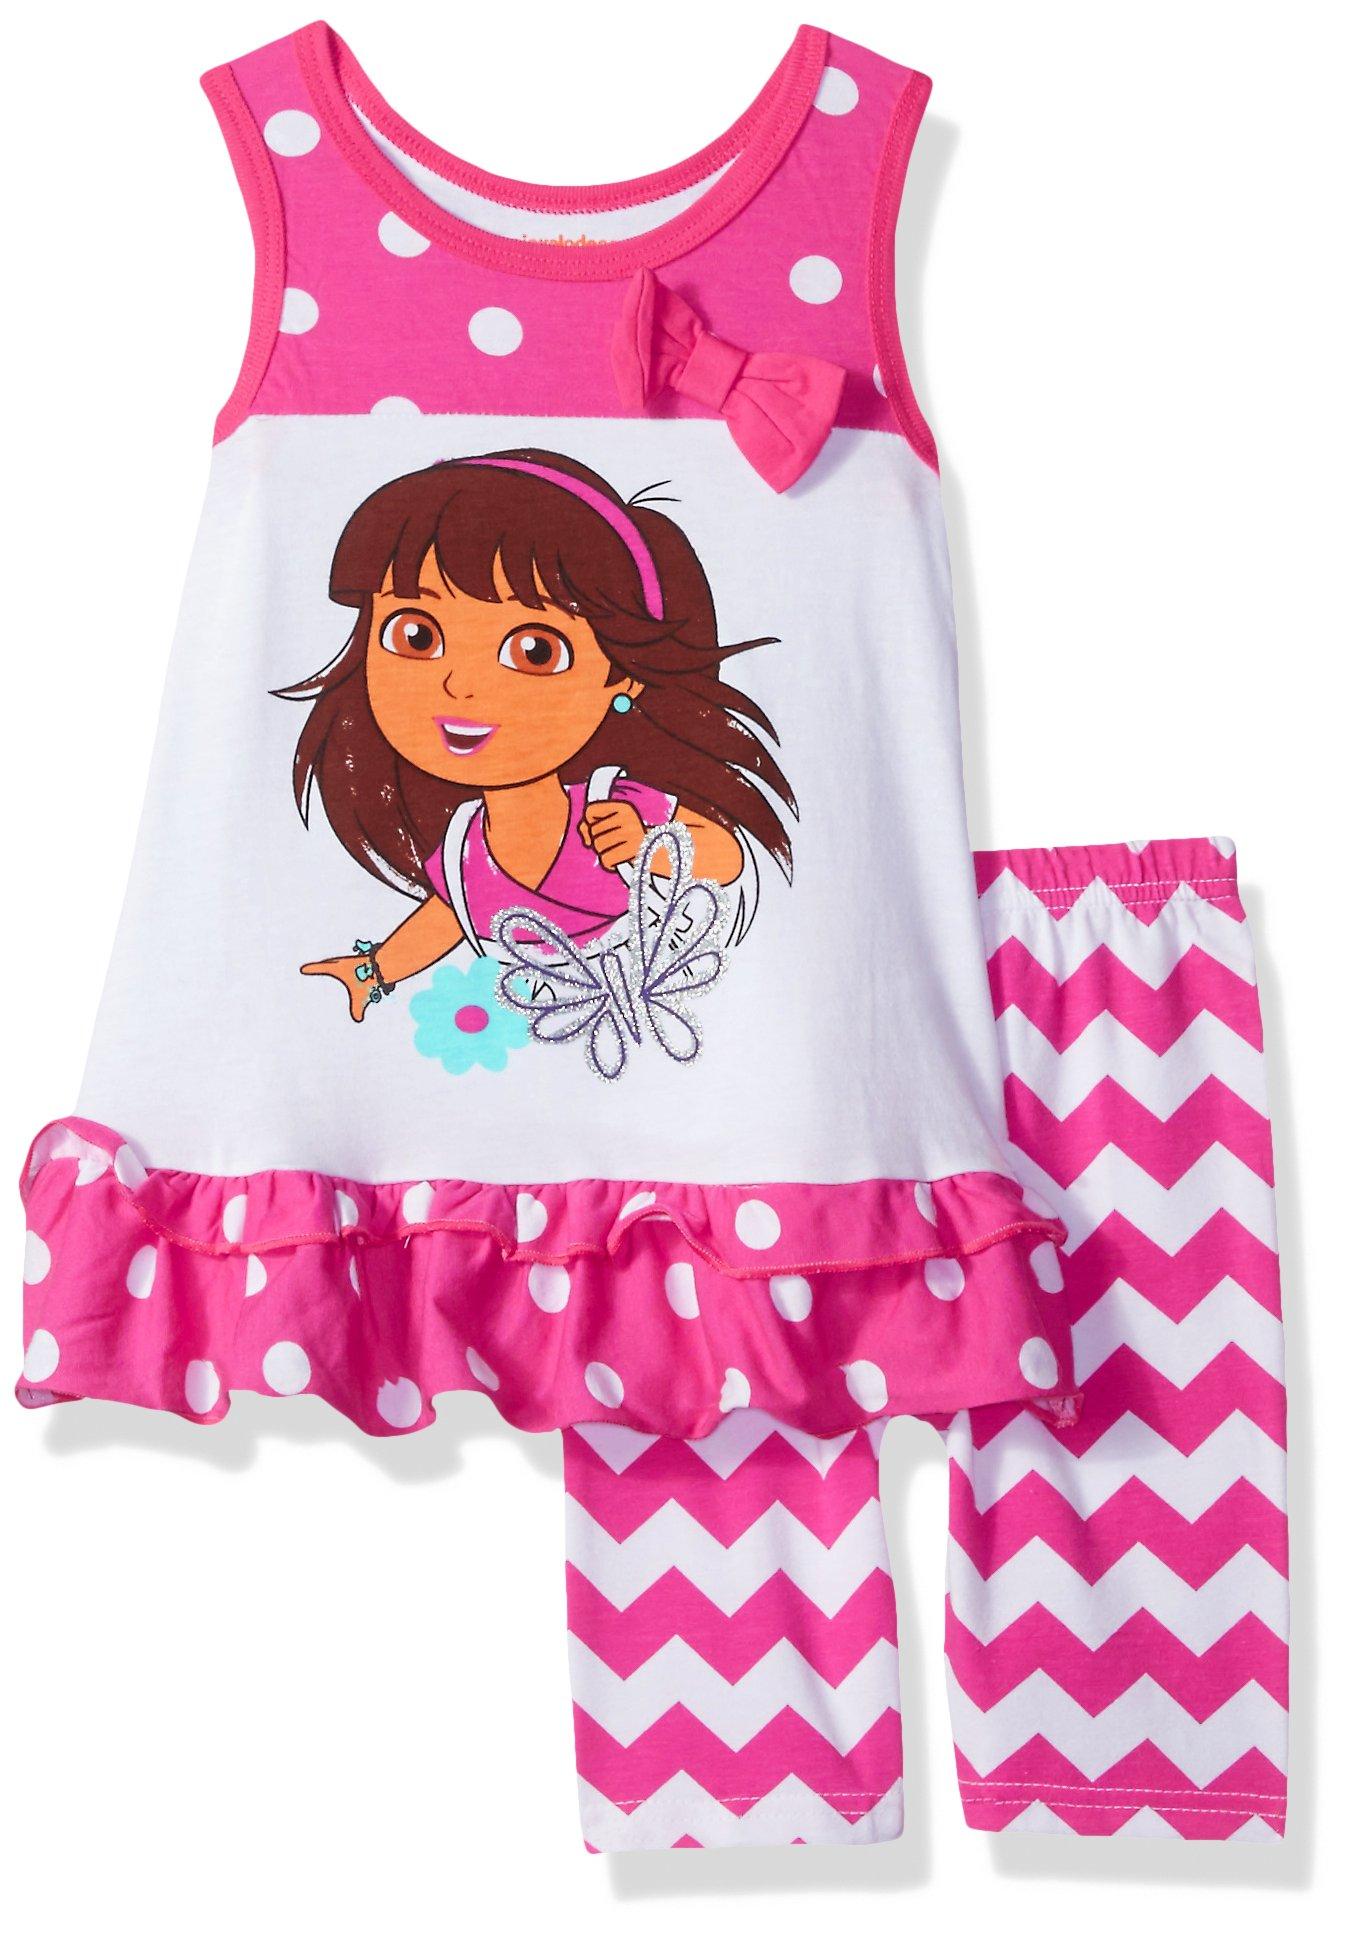 Nickelodeon Little Girls' Dora The Explorer 2 Piece Bike Short Set, Pink, 6